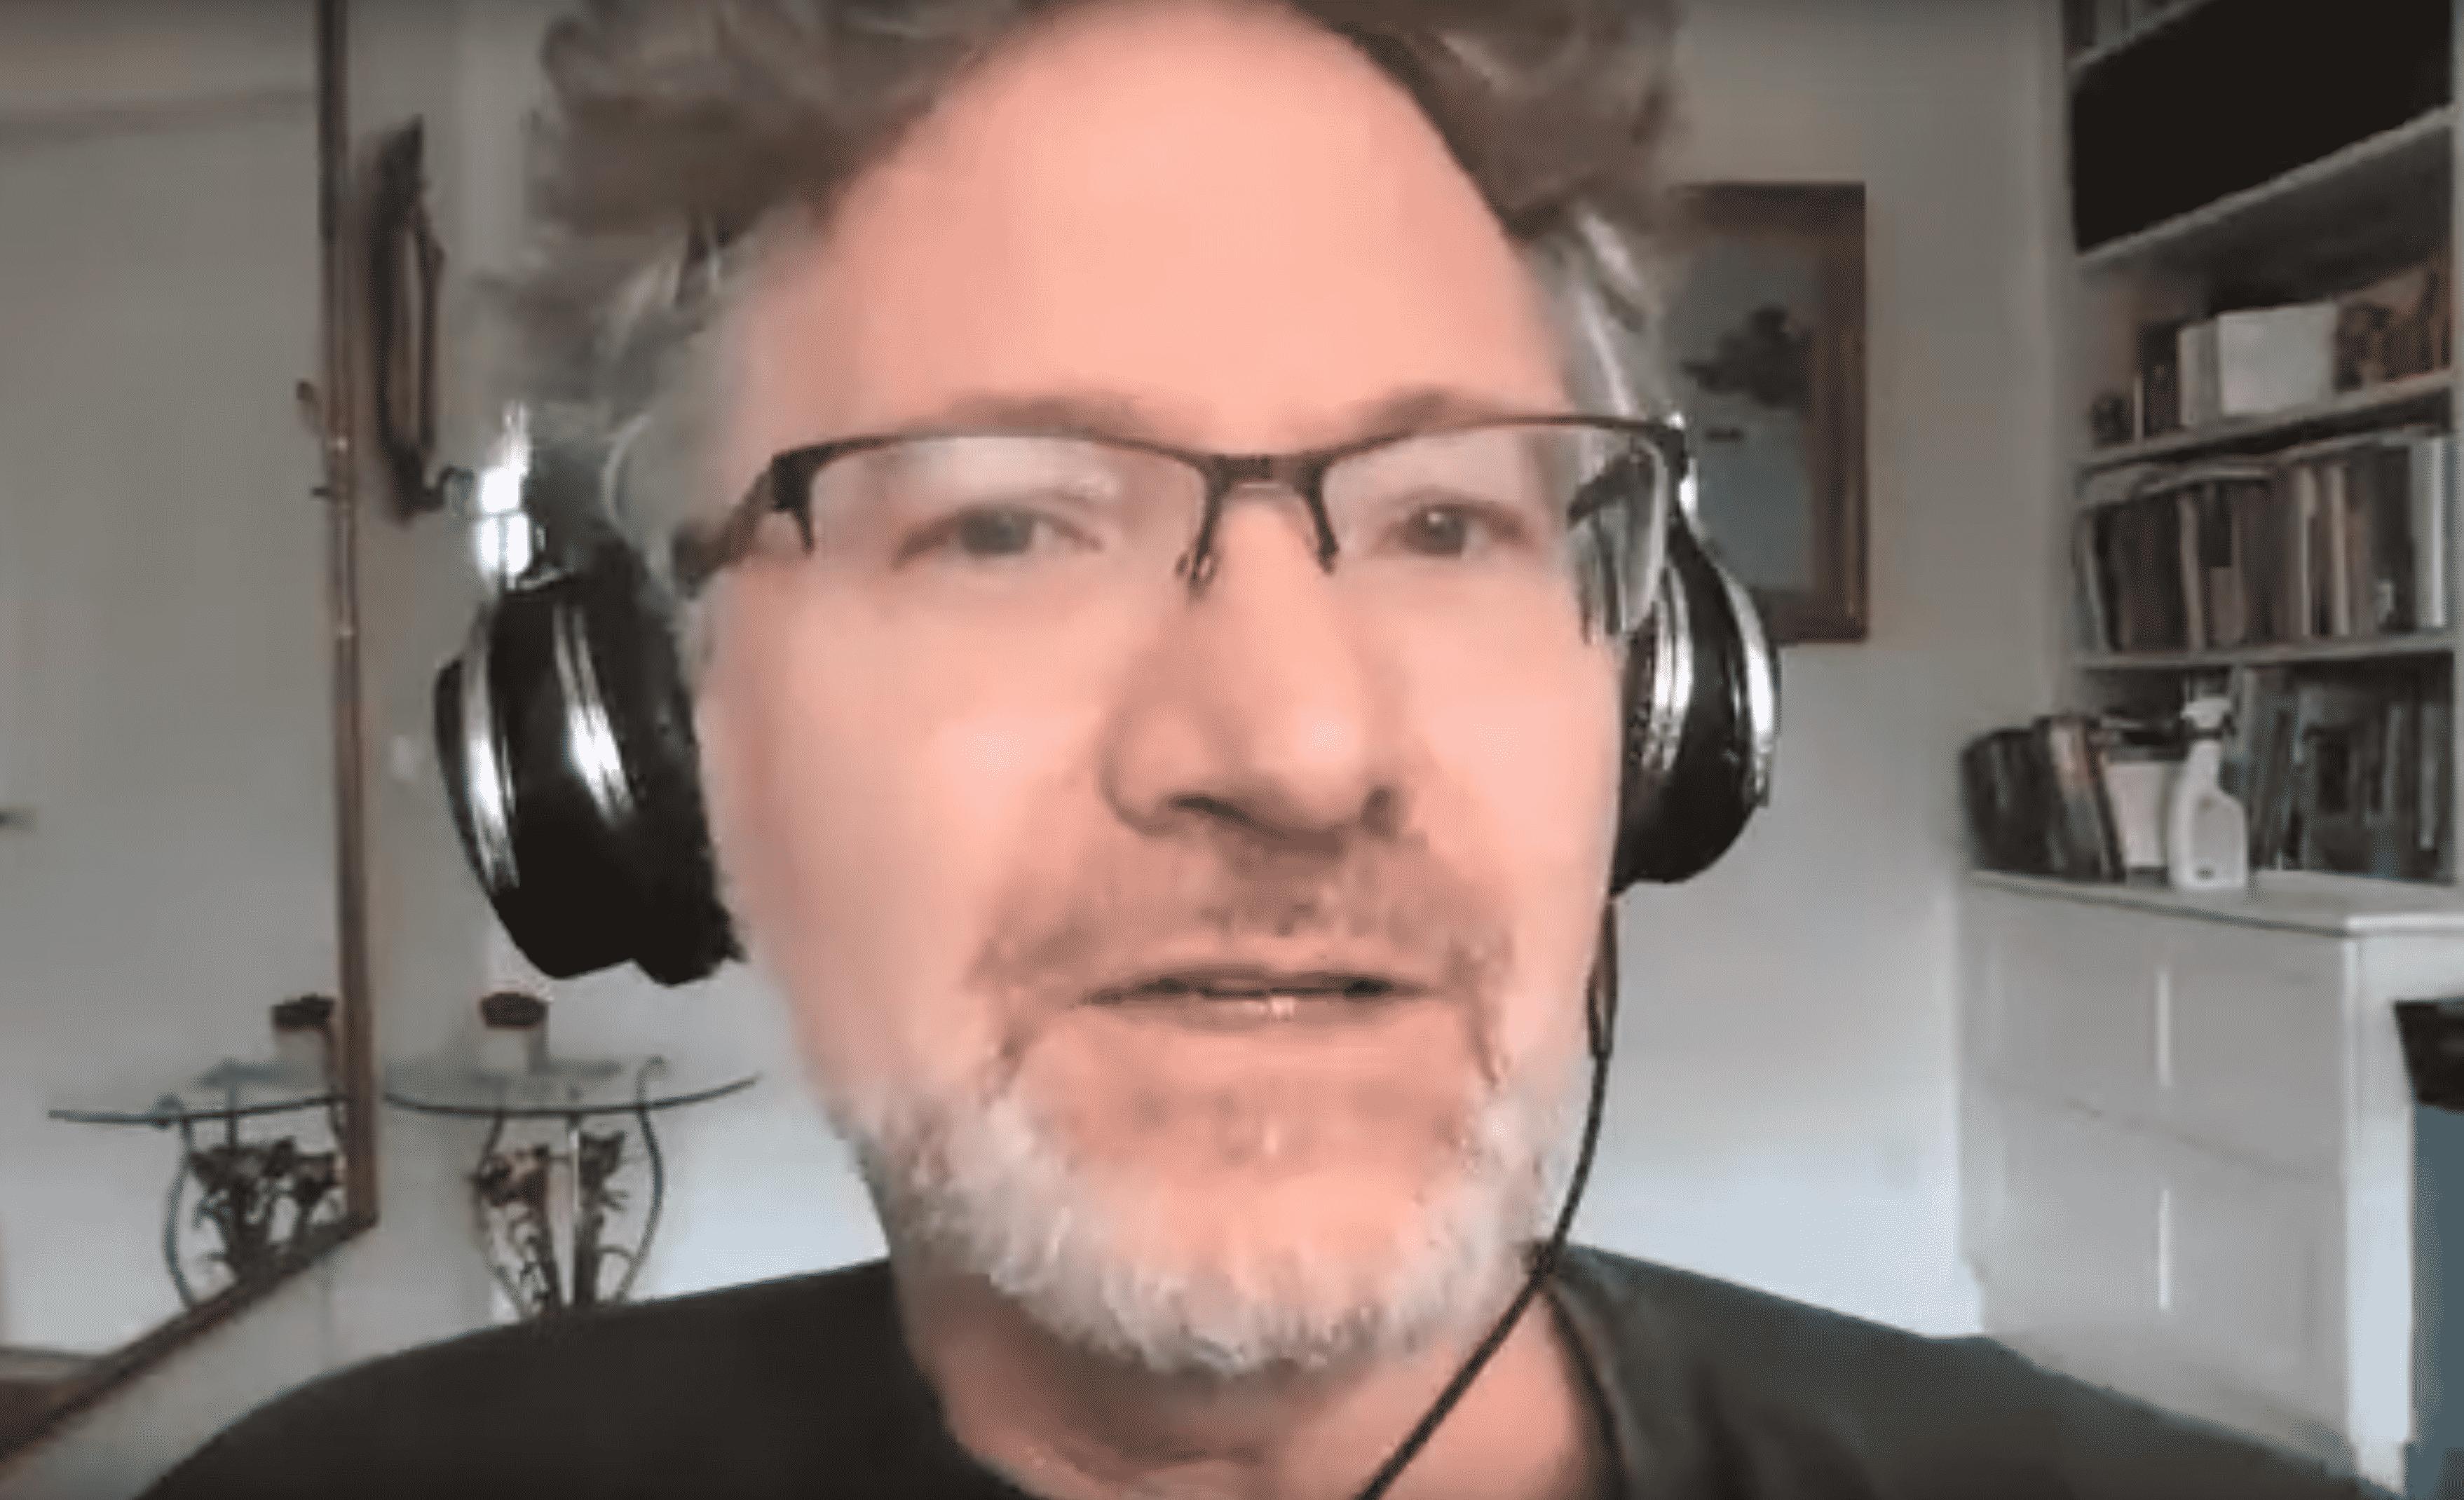 Adam Tooze speaking with headphones on